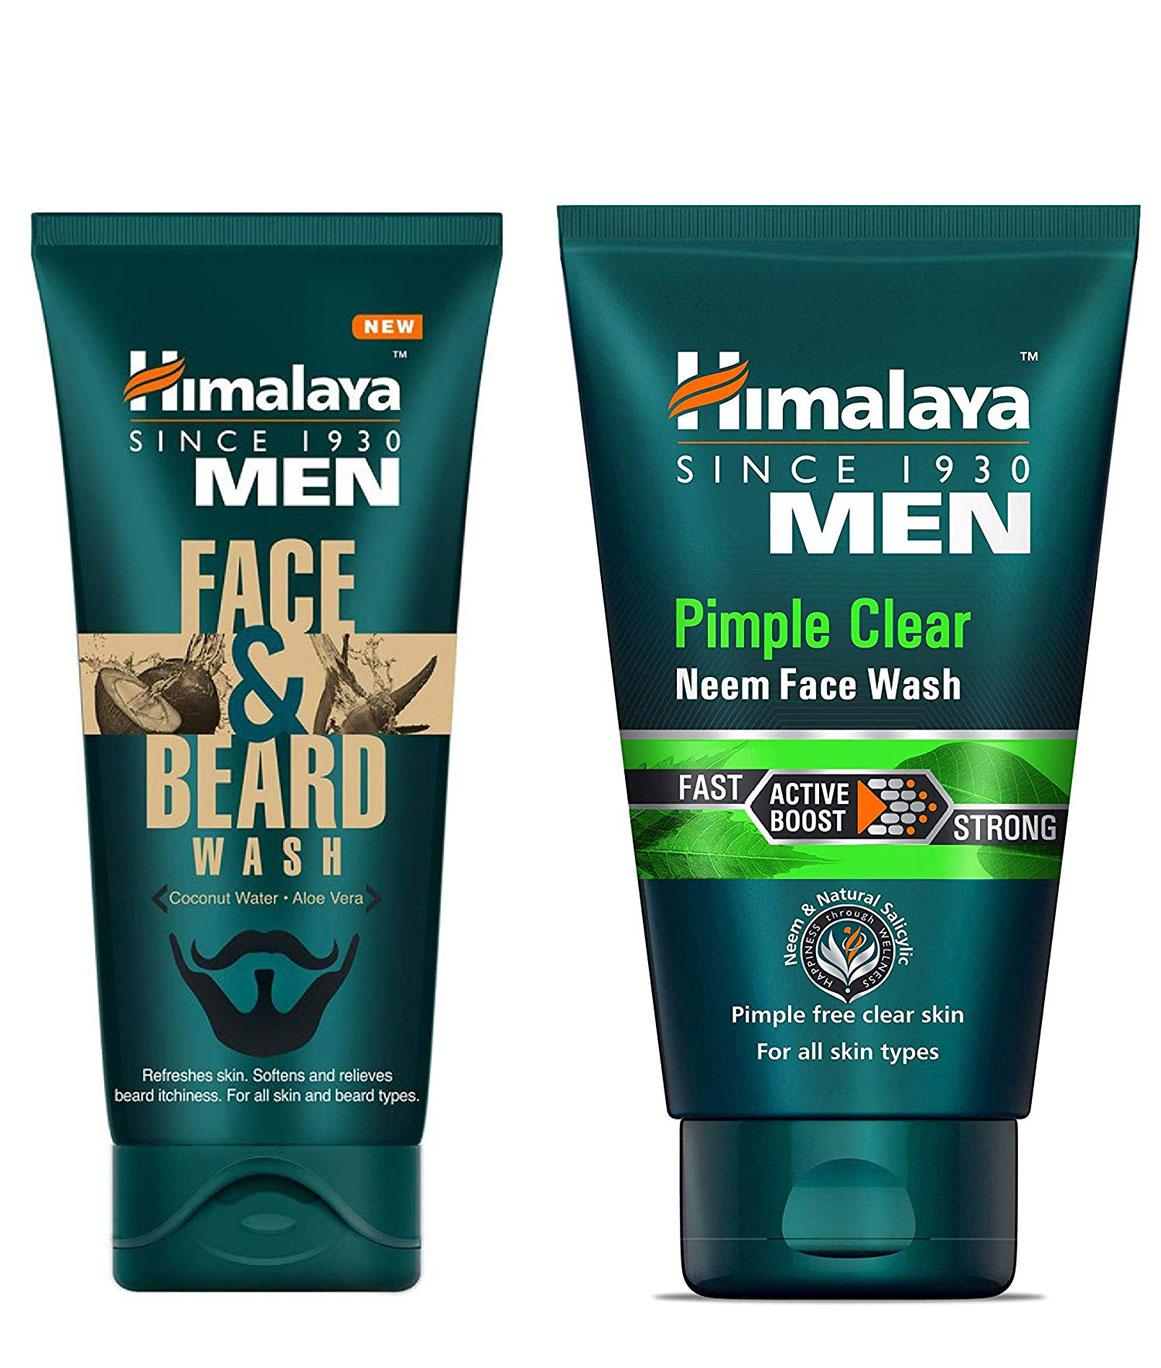 Himalaya Men Face And Beard Wash 80ml and Himalaya Herbls Men Pimple Clear Neem Face Wash 100ml